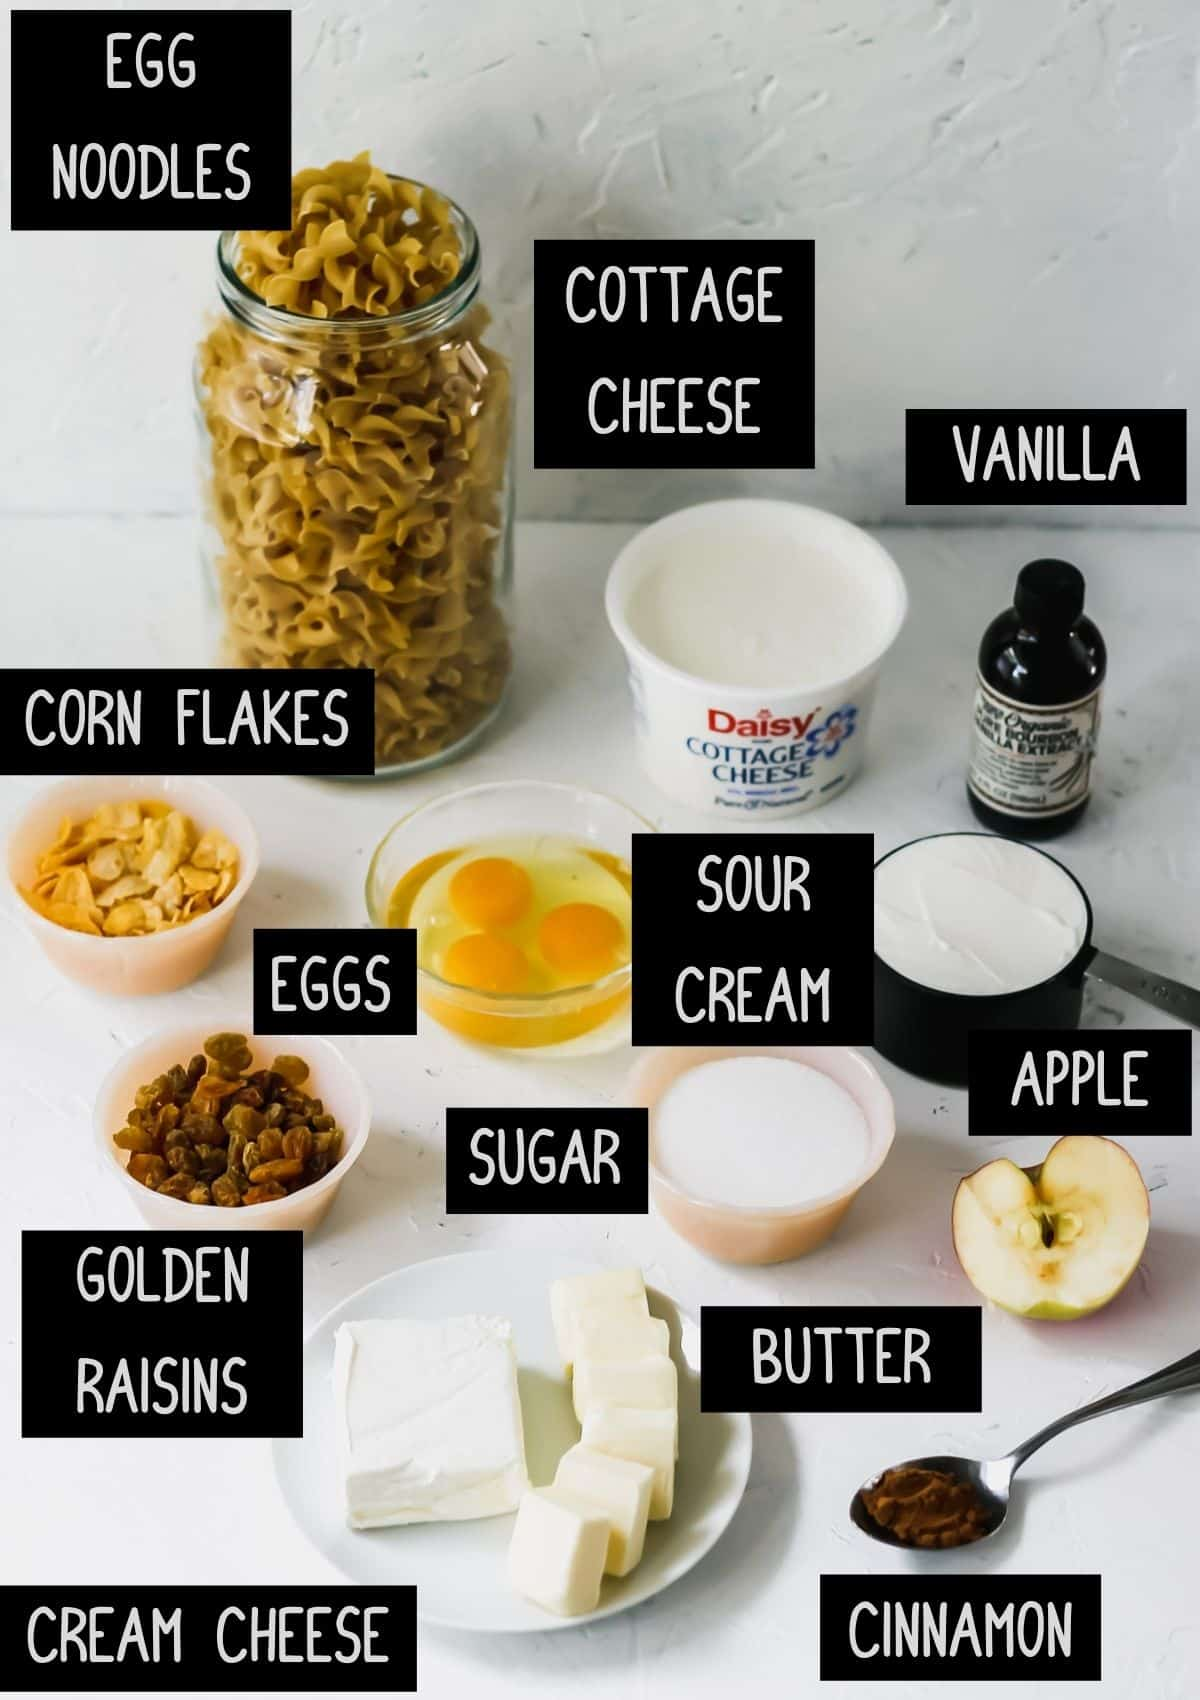 Labelled ingredients for cinnamon apple noodle kugel (see recipe for details).